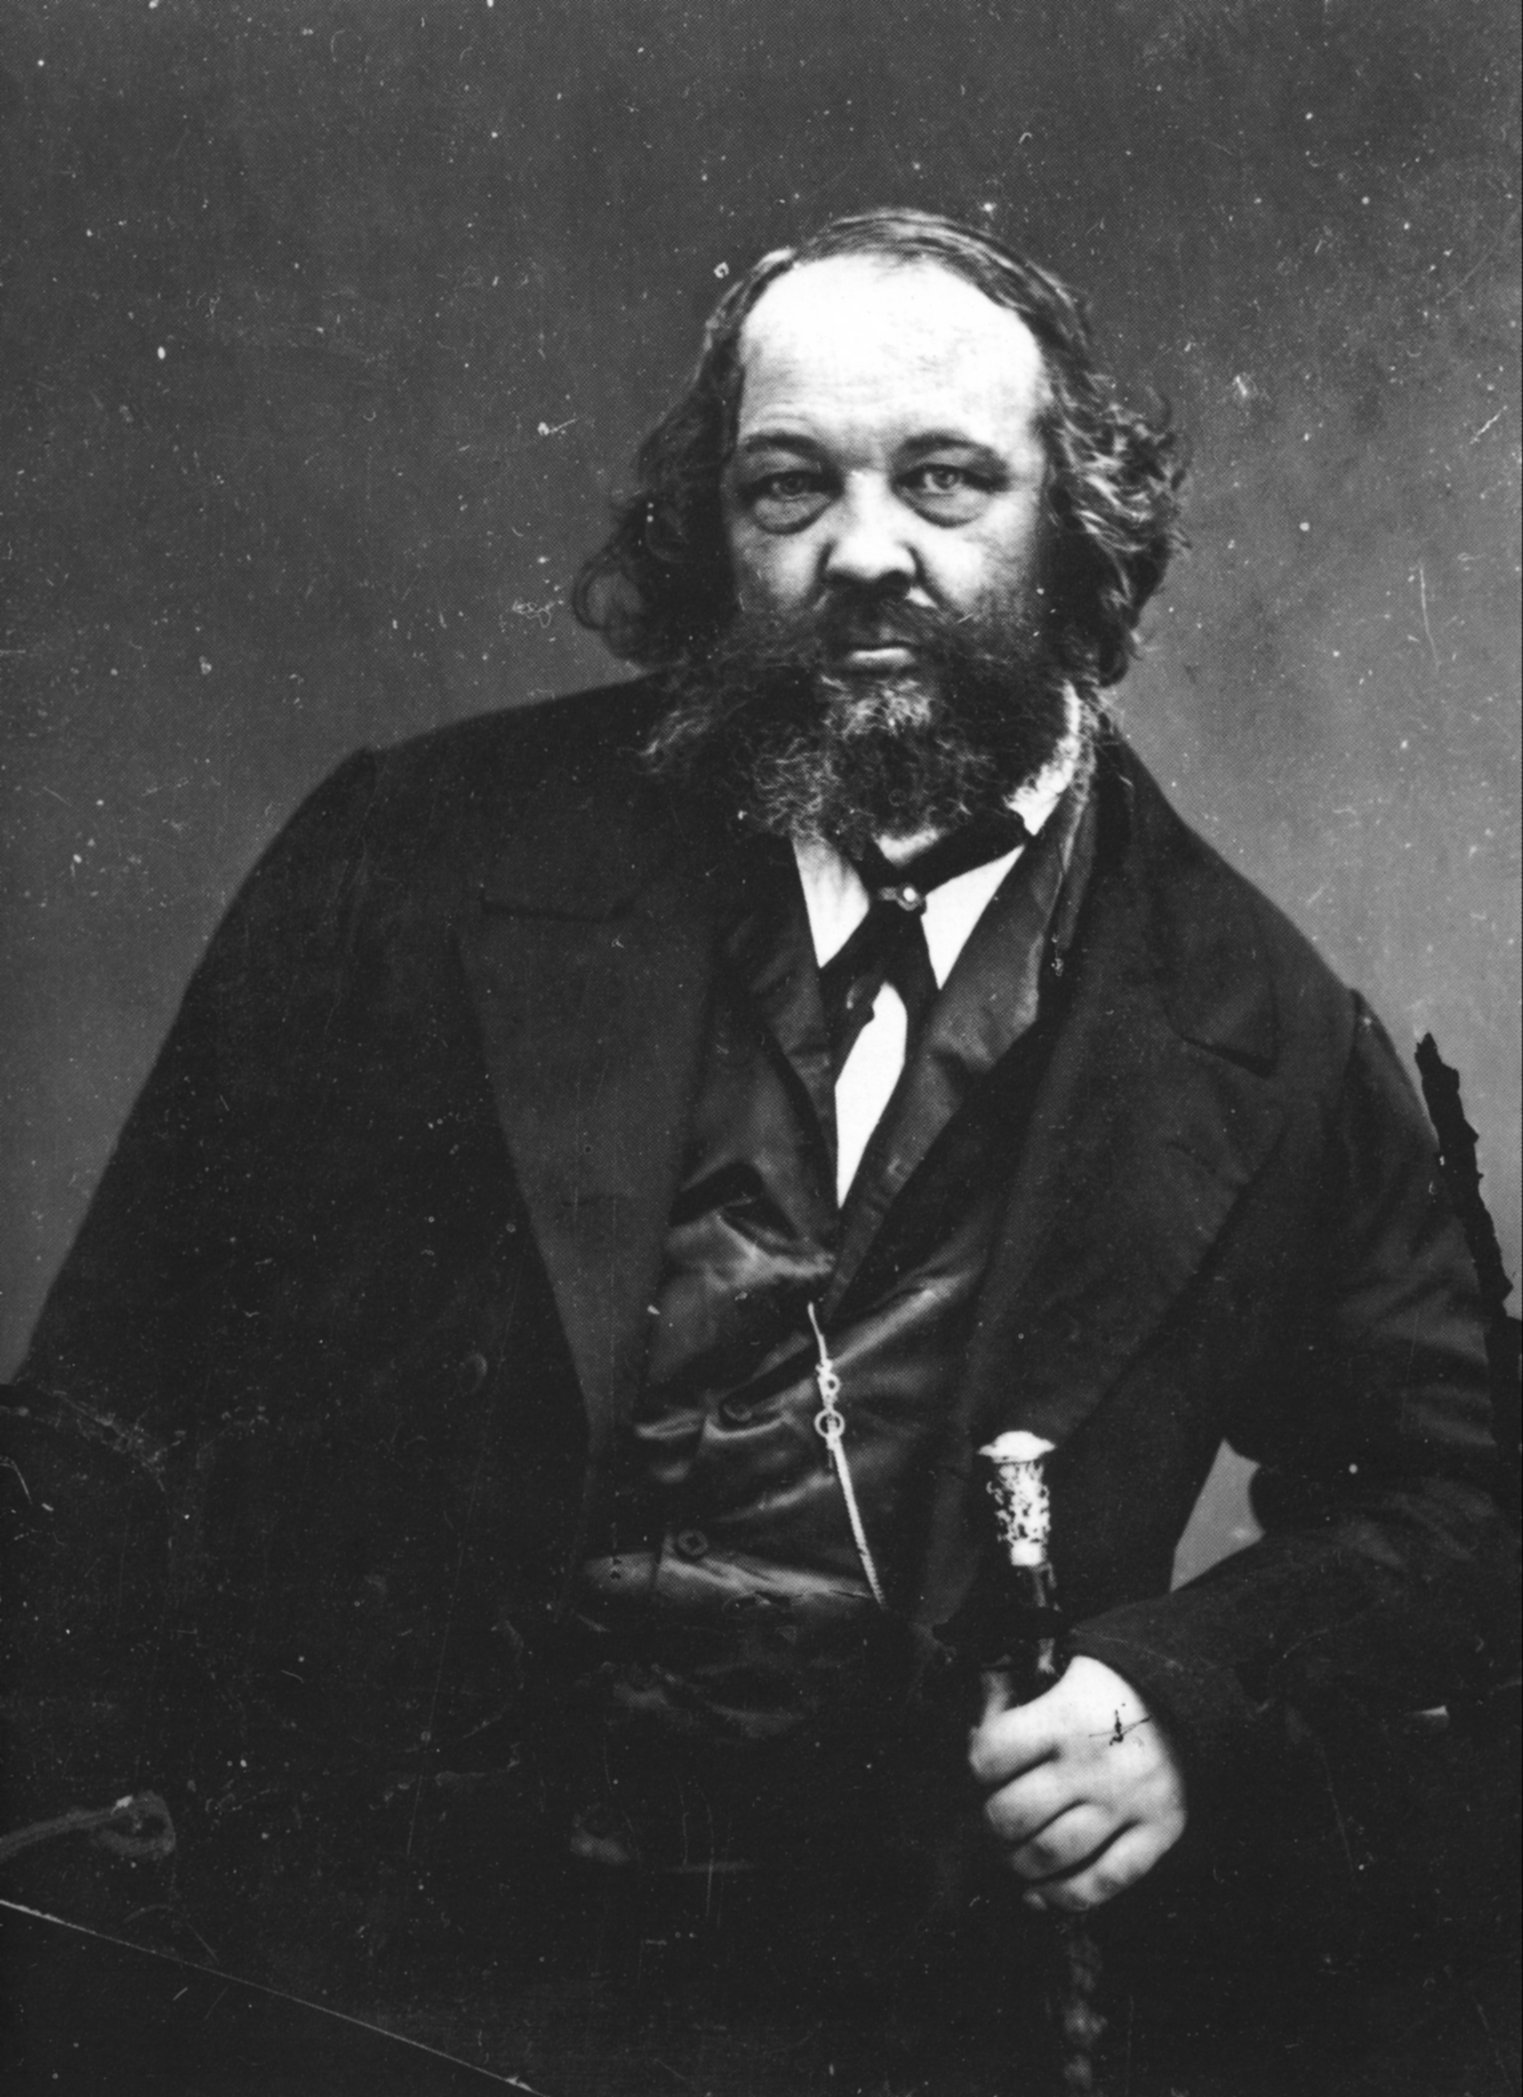 Félix Nadar 1820-1910 portraits Makhail Bakounine.jpg